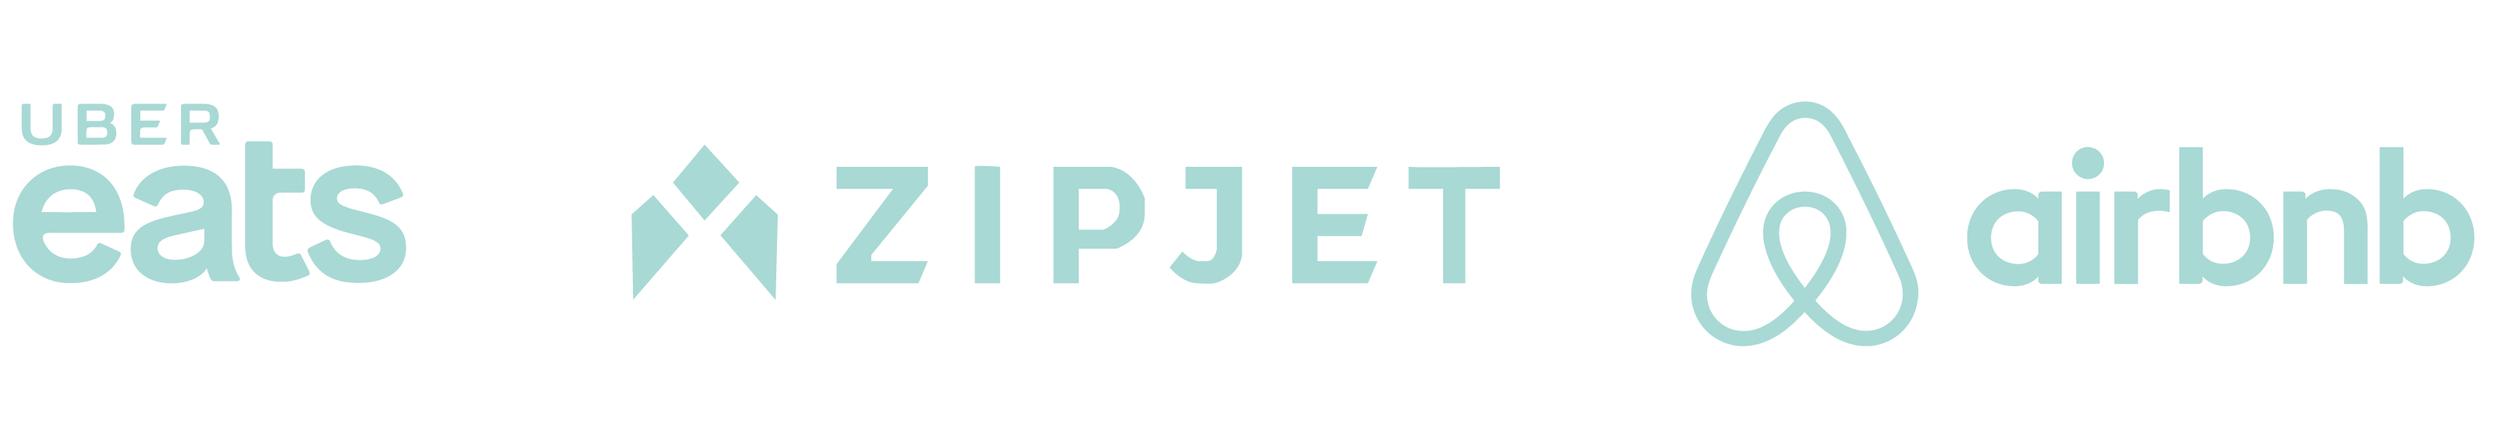 LogoStripJuly2019Part2B.png